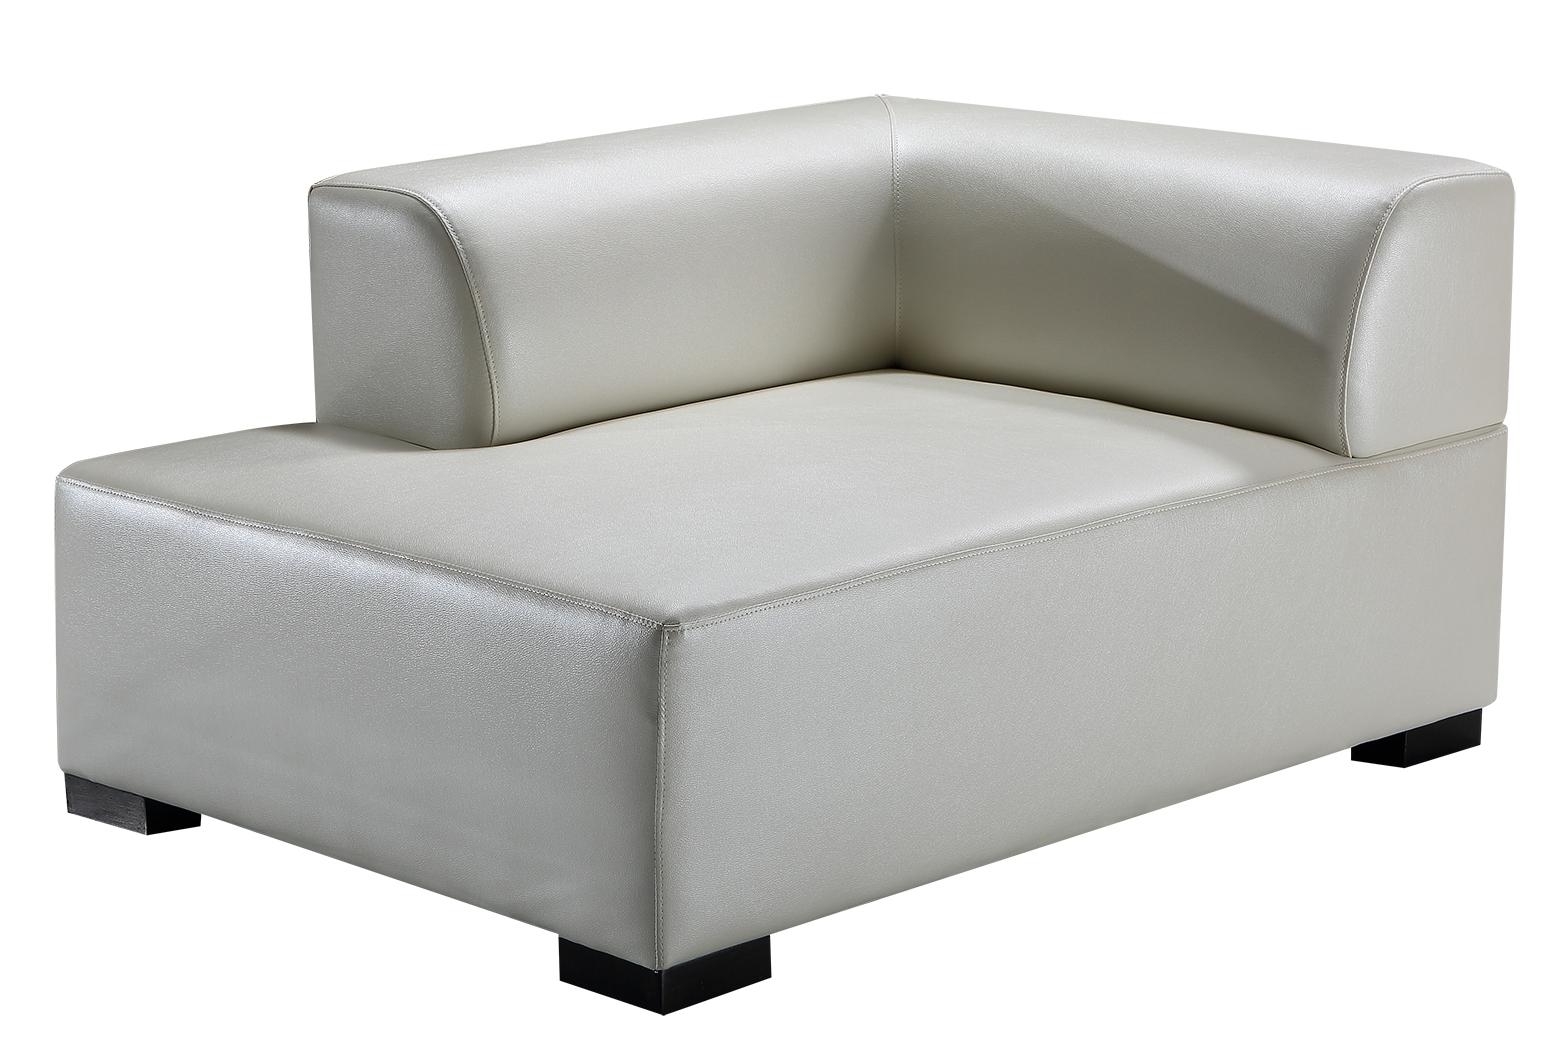 ecksofas sofas b nke ingastro restaurant m bel direkt vom importeur. Black Bedroom Furniture Sets. Home Design Ideas